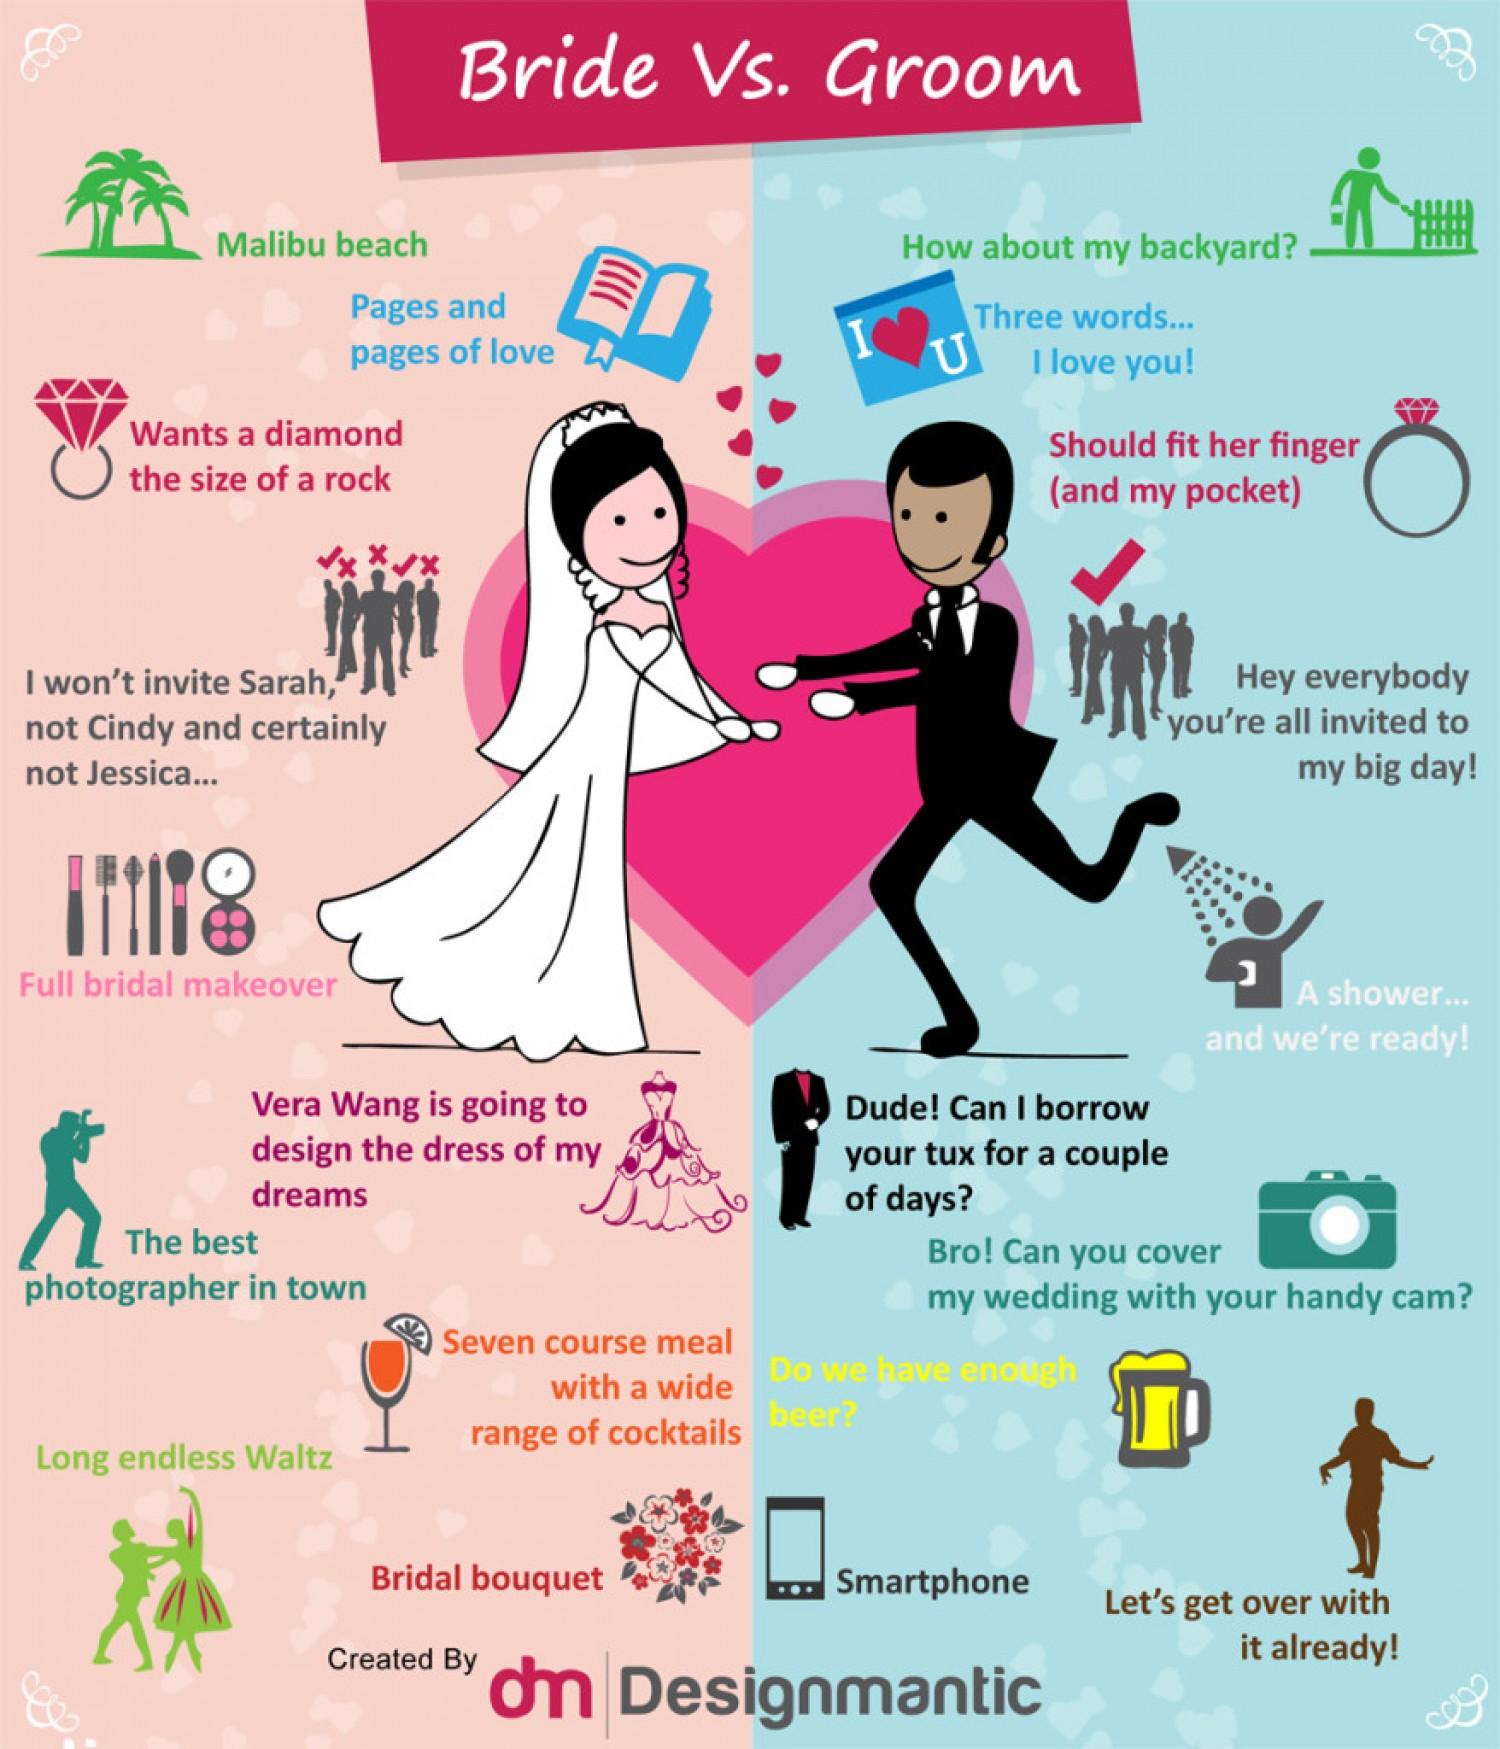 06 infographic-bride-vs-groom-what-unites-them-on-wedding_53302ac347406_w1500